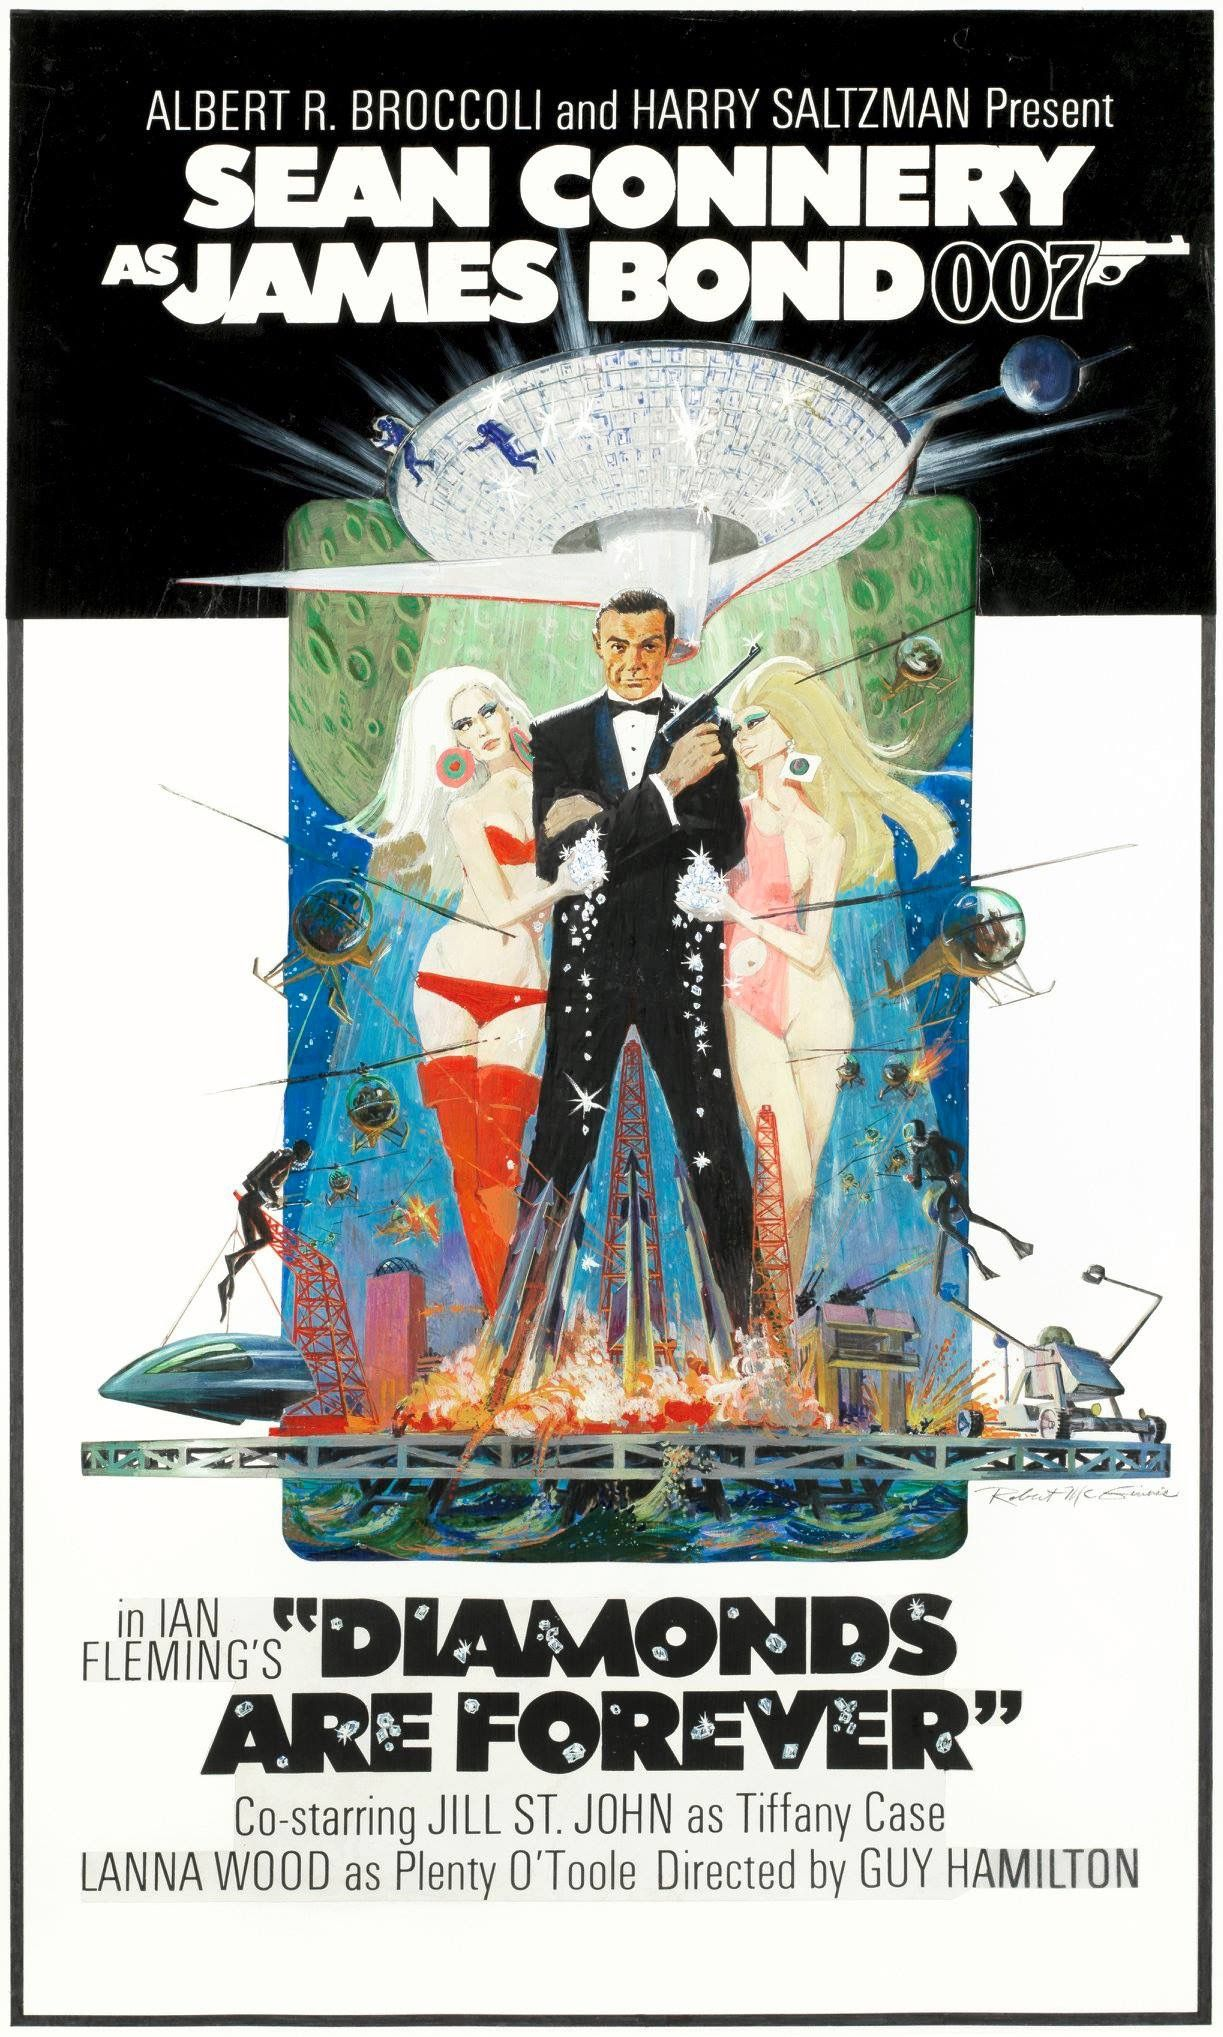 Poster Concept James Bond Movies James Bond Movie Posters Bond